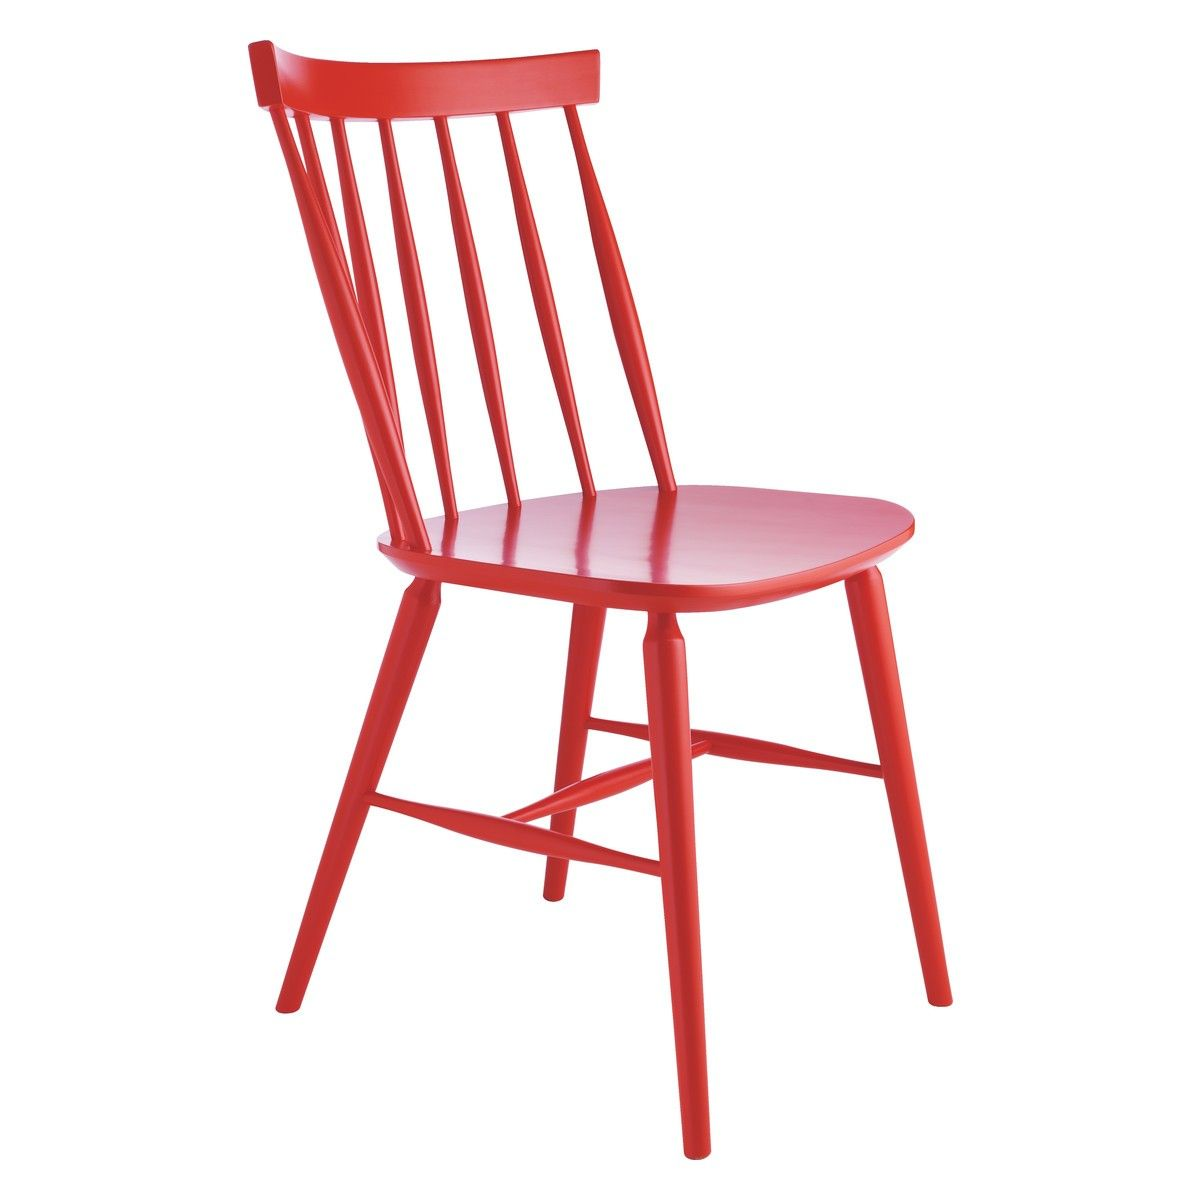 Buy Dining Chair: Buy Now At Habitat UK In 2019